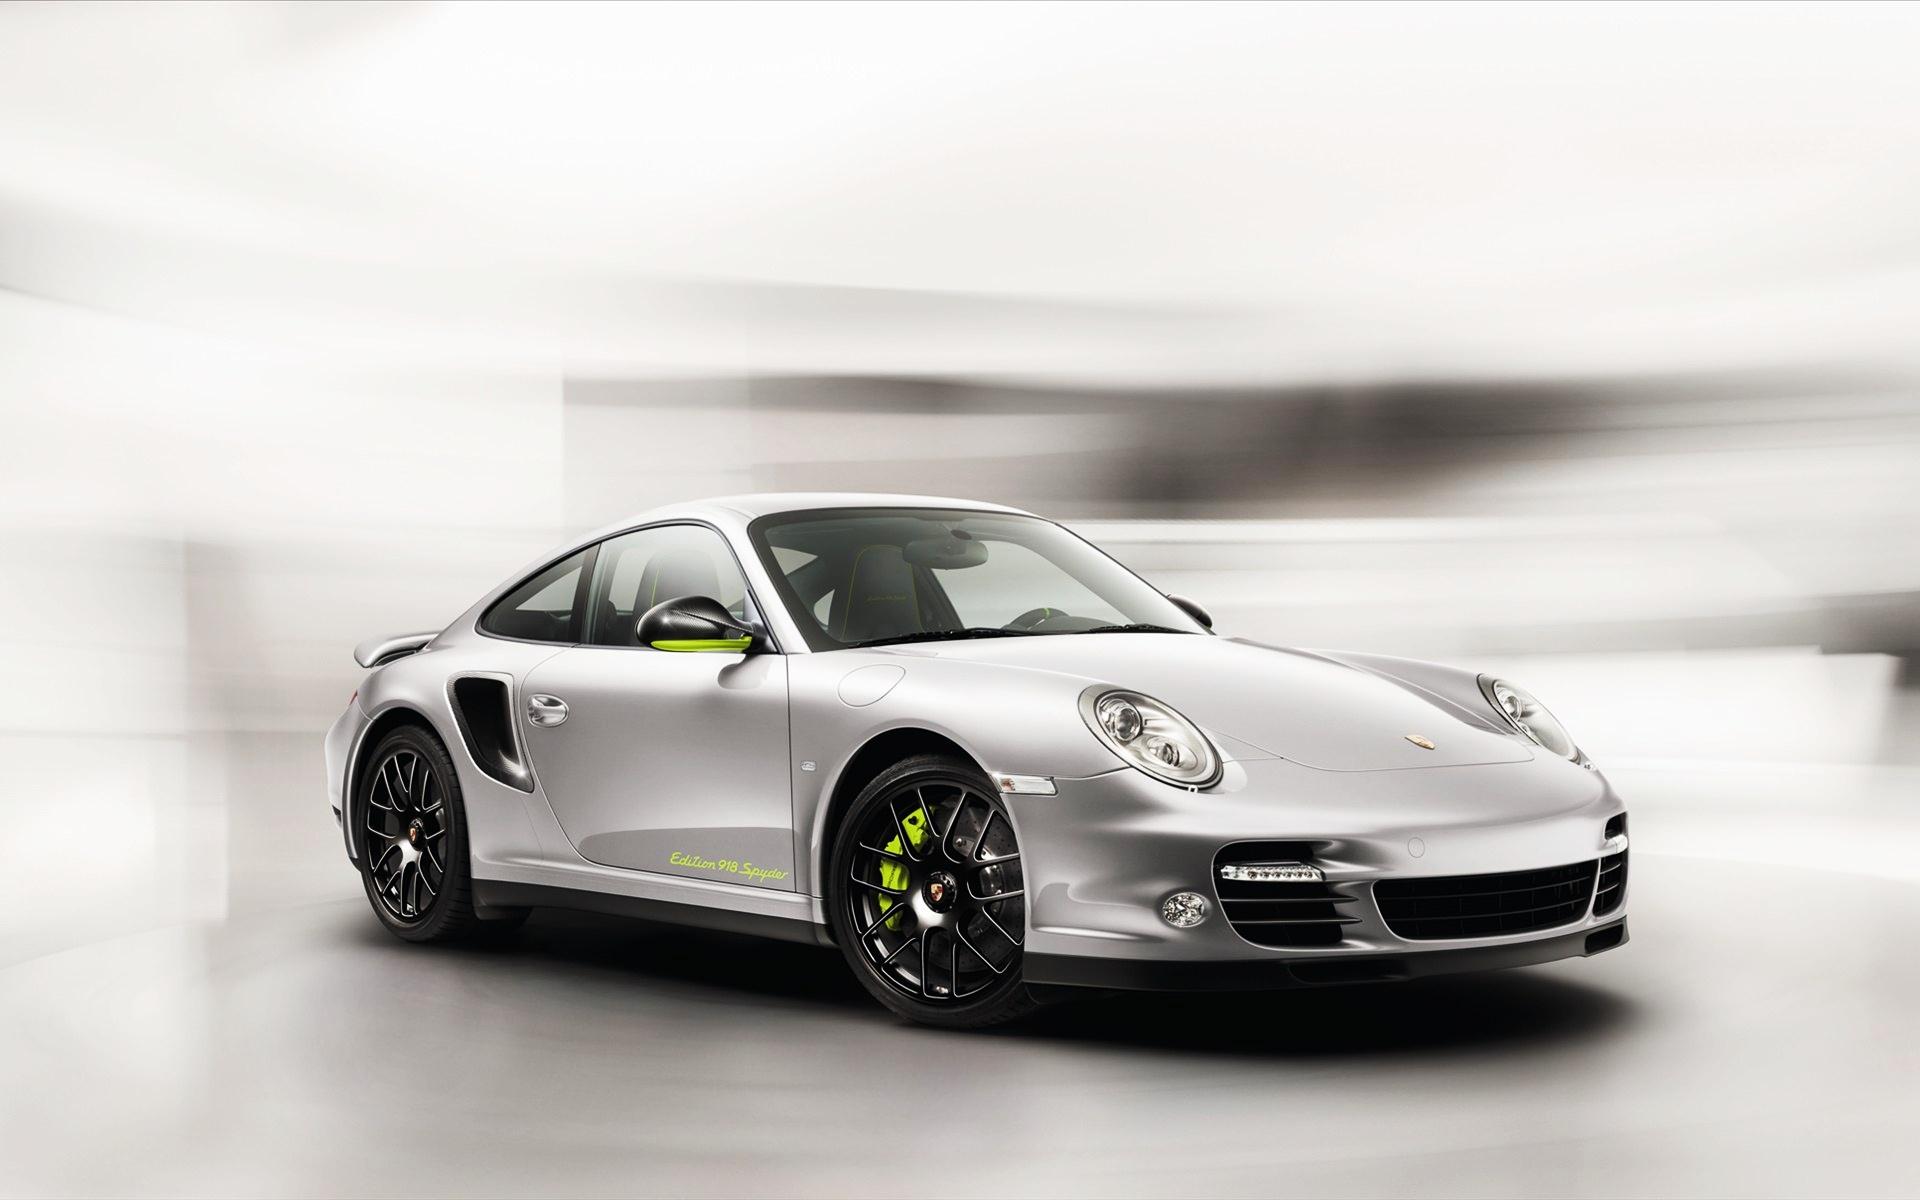 Porsche 911 Turbo Spyder Wallpapers HD Wallpapers 1920x1200